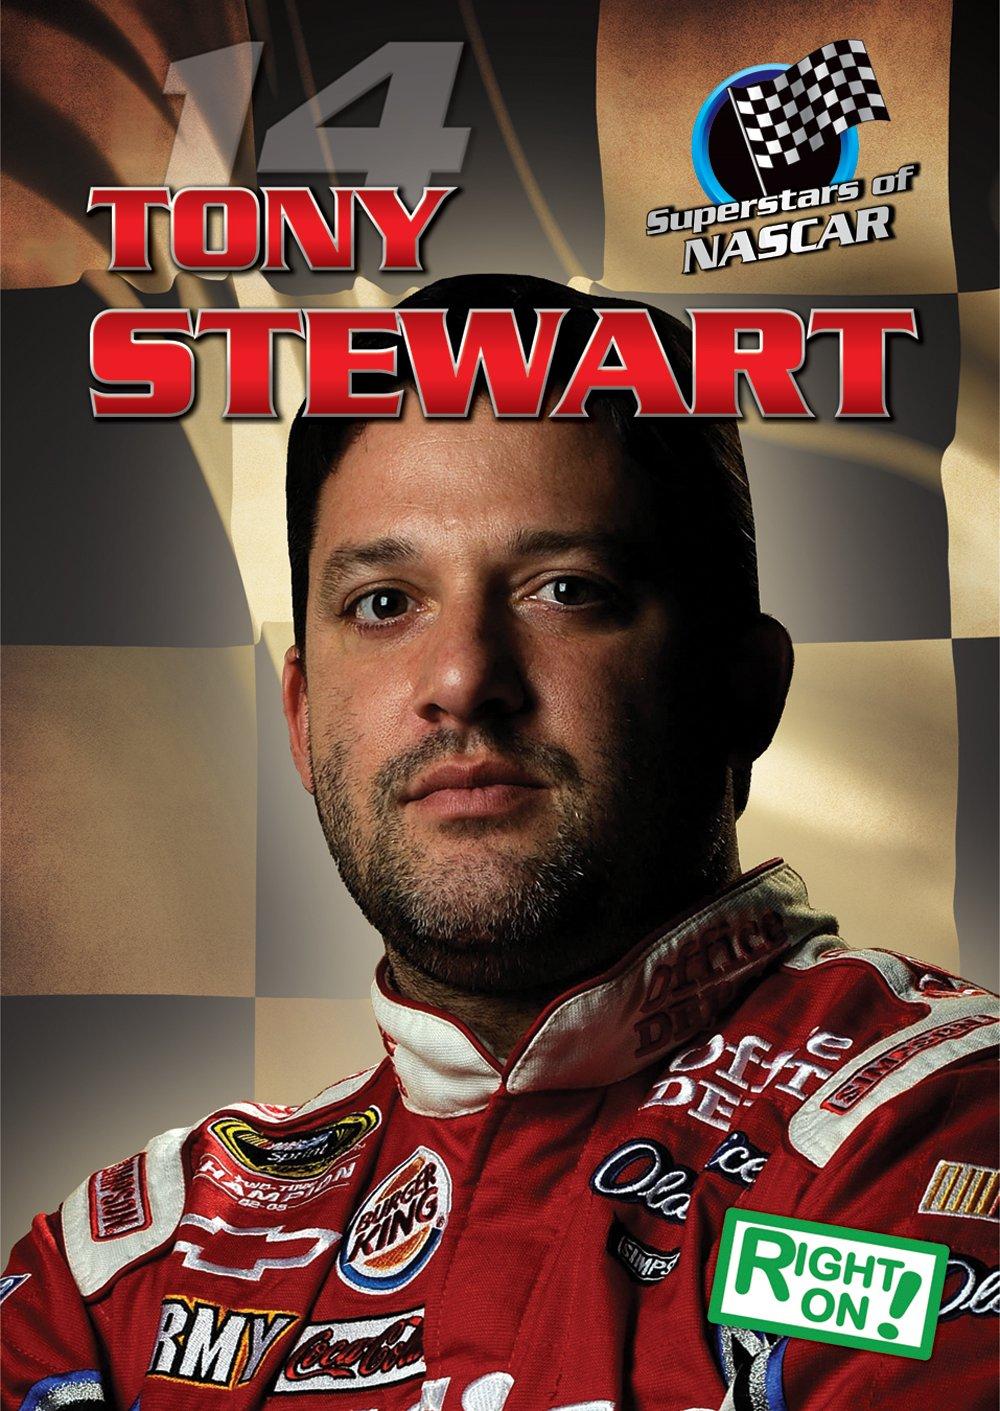 Tony Stewart (Superstars of NASCAR)